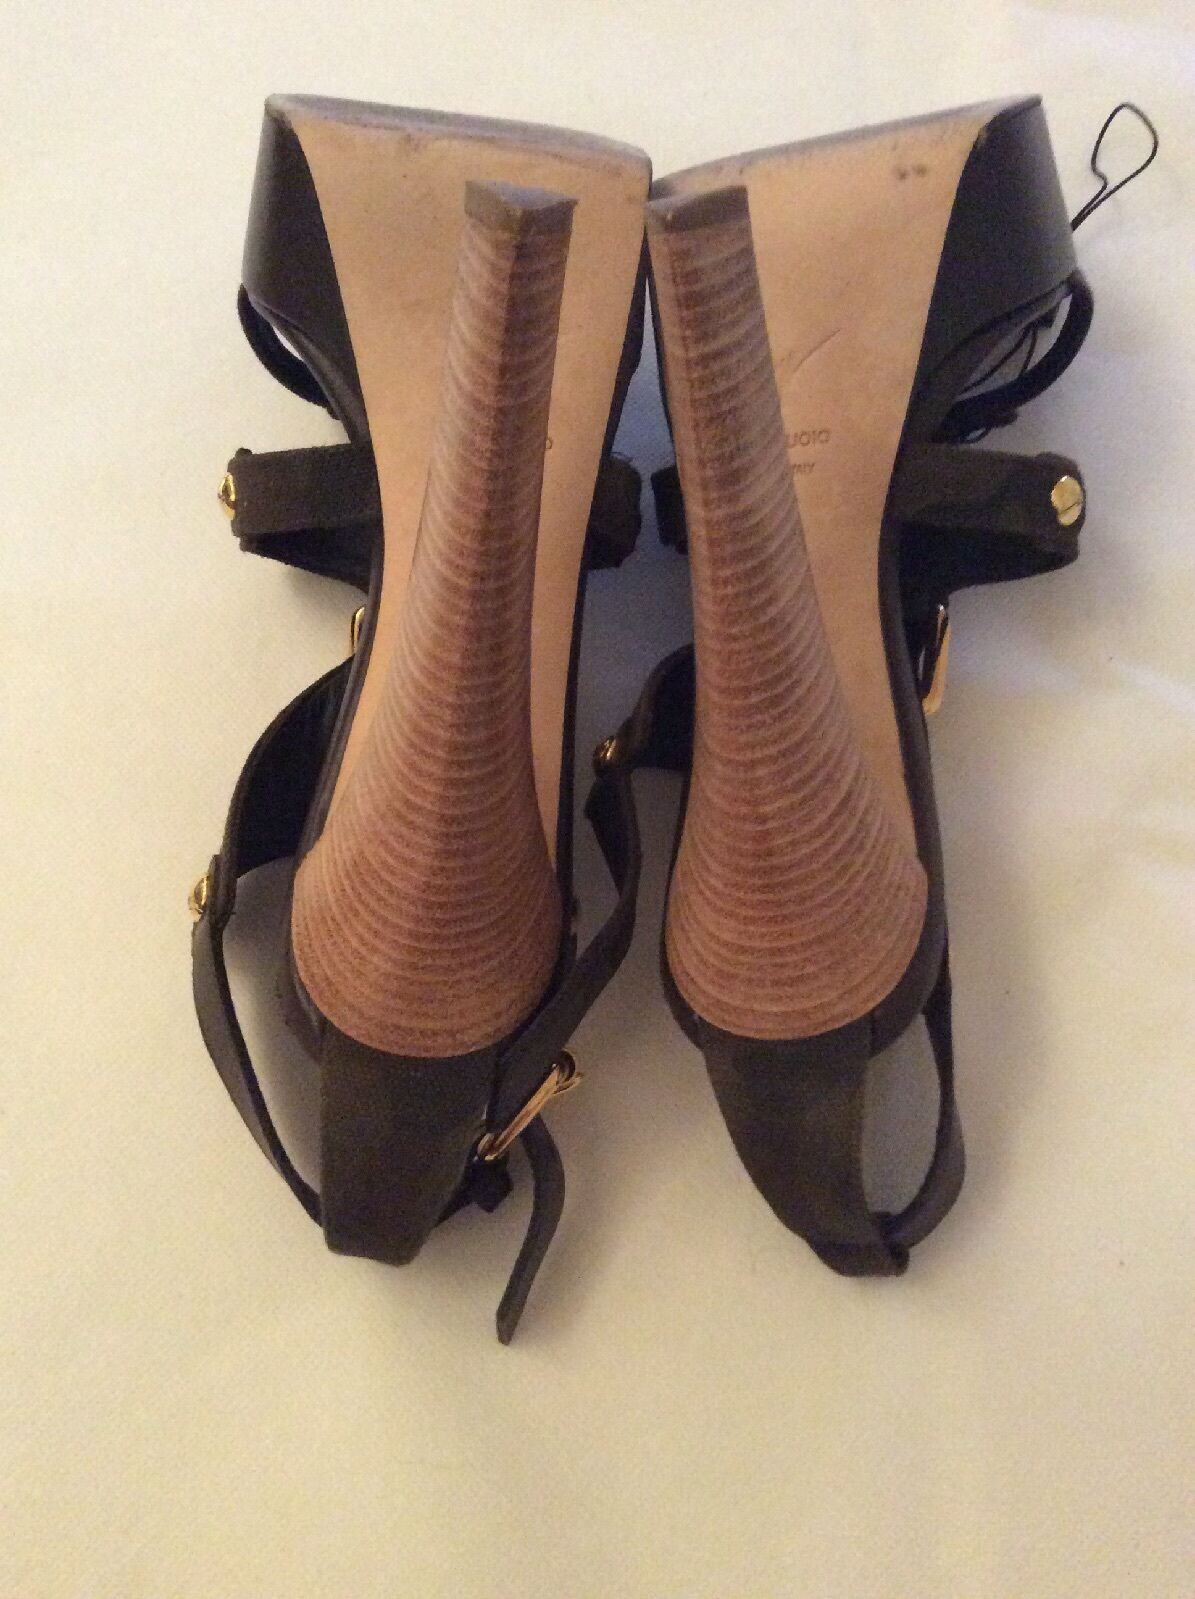 Authentic Giuseppe Zanotti chunky size High heeled sandals  UK size chunky 7, f00322